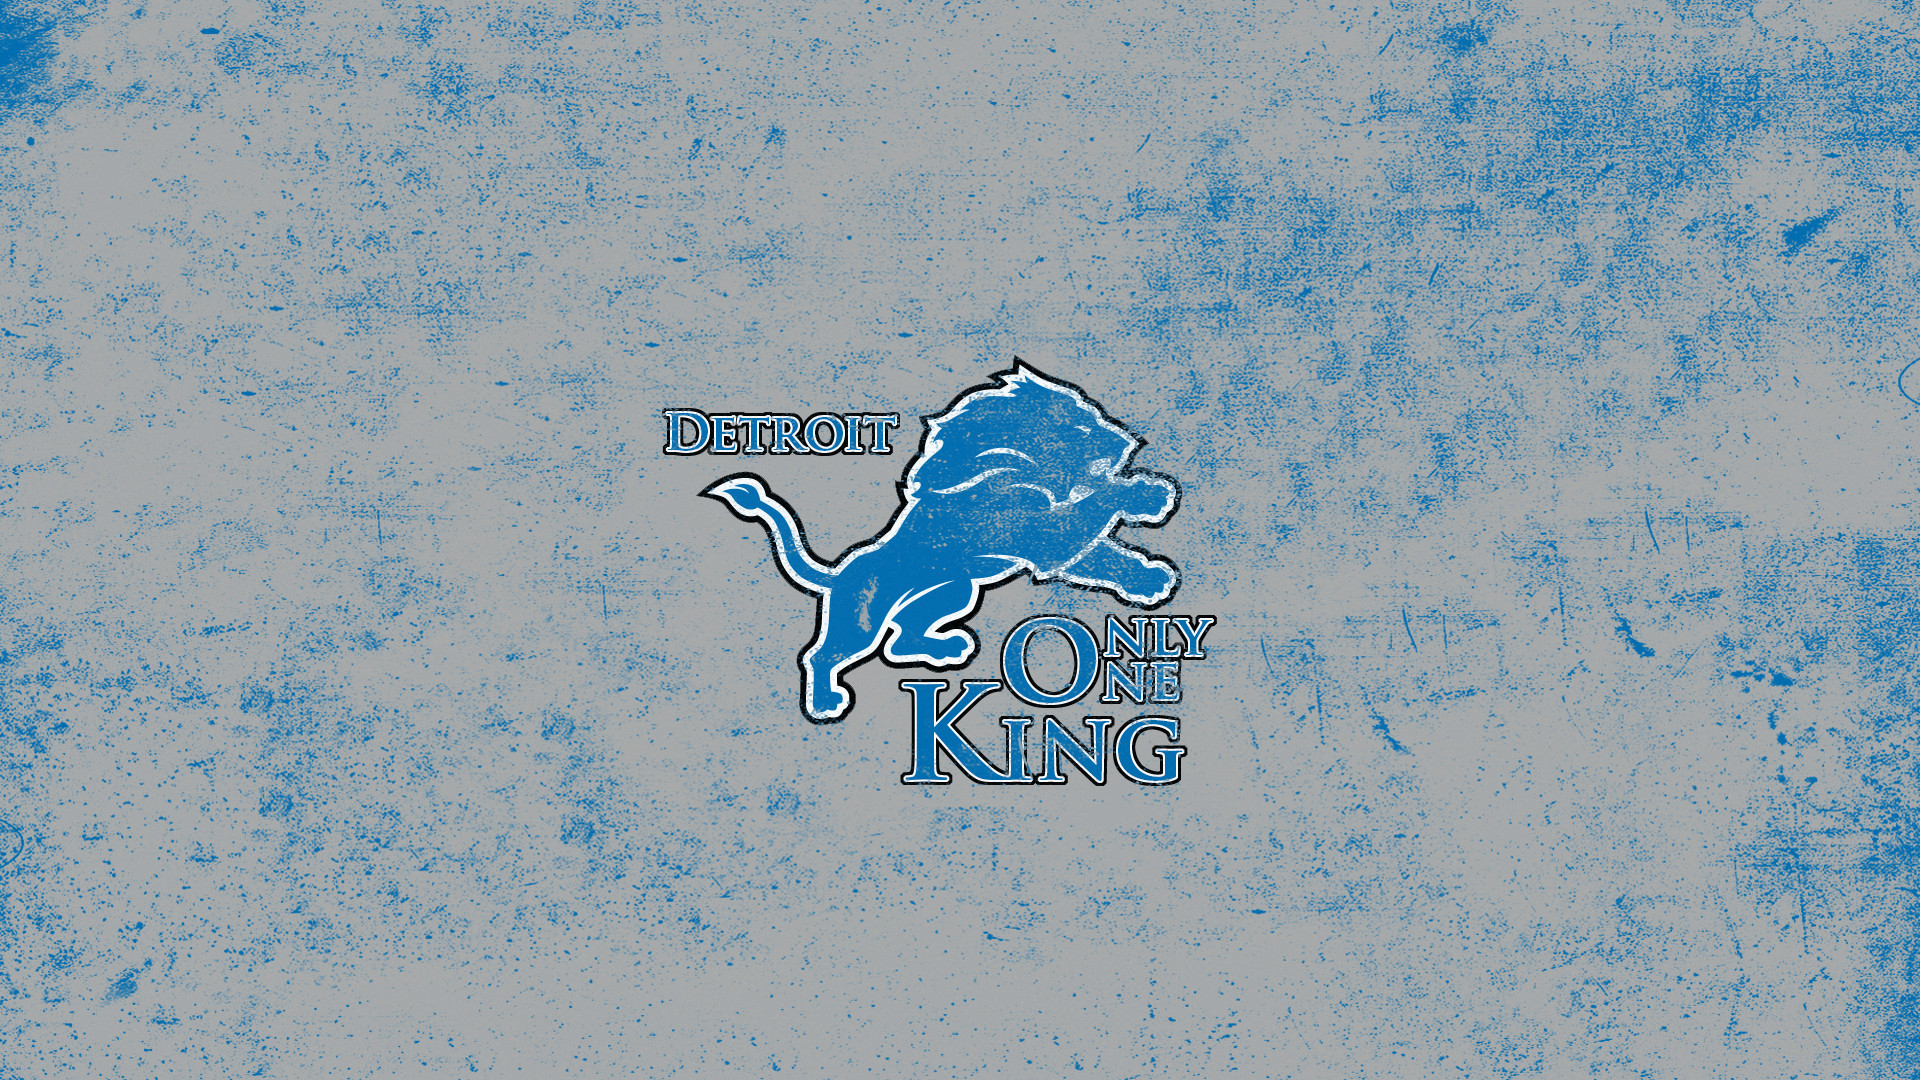 10 hd detroit lions wallpapers